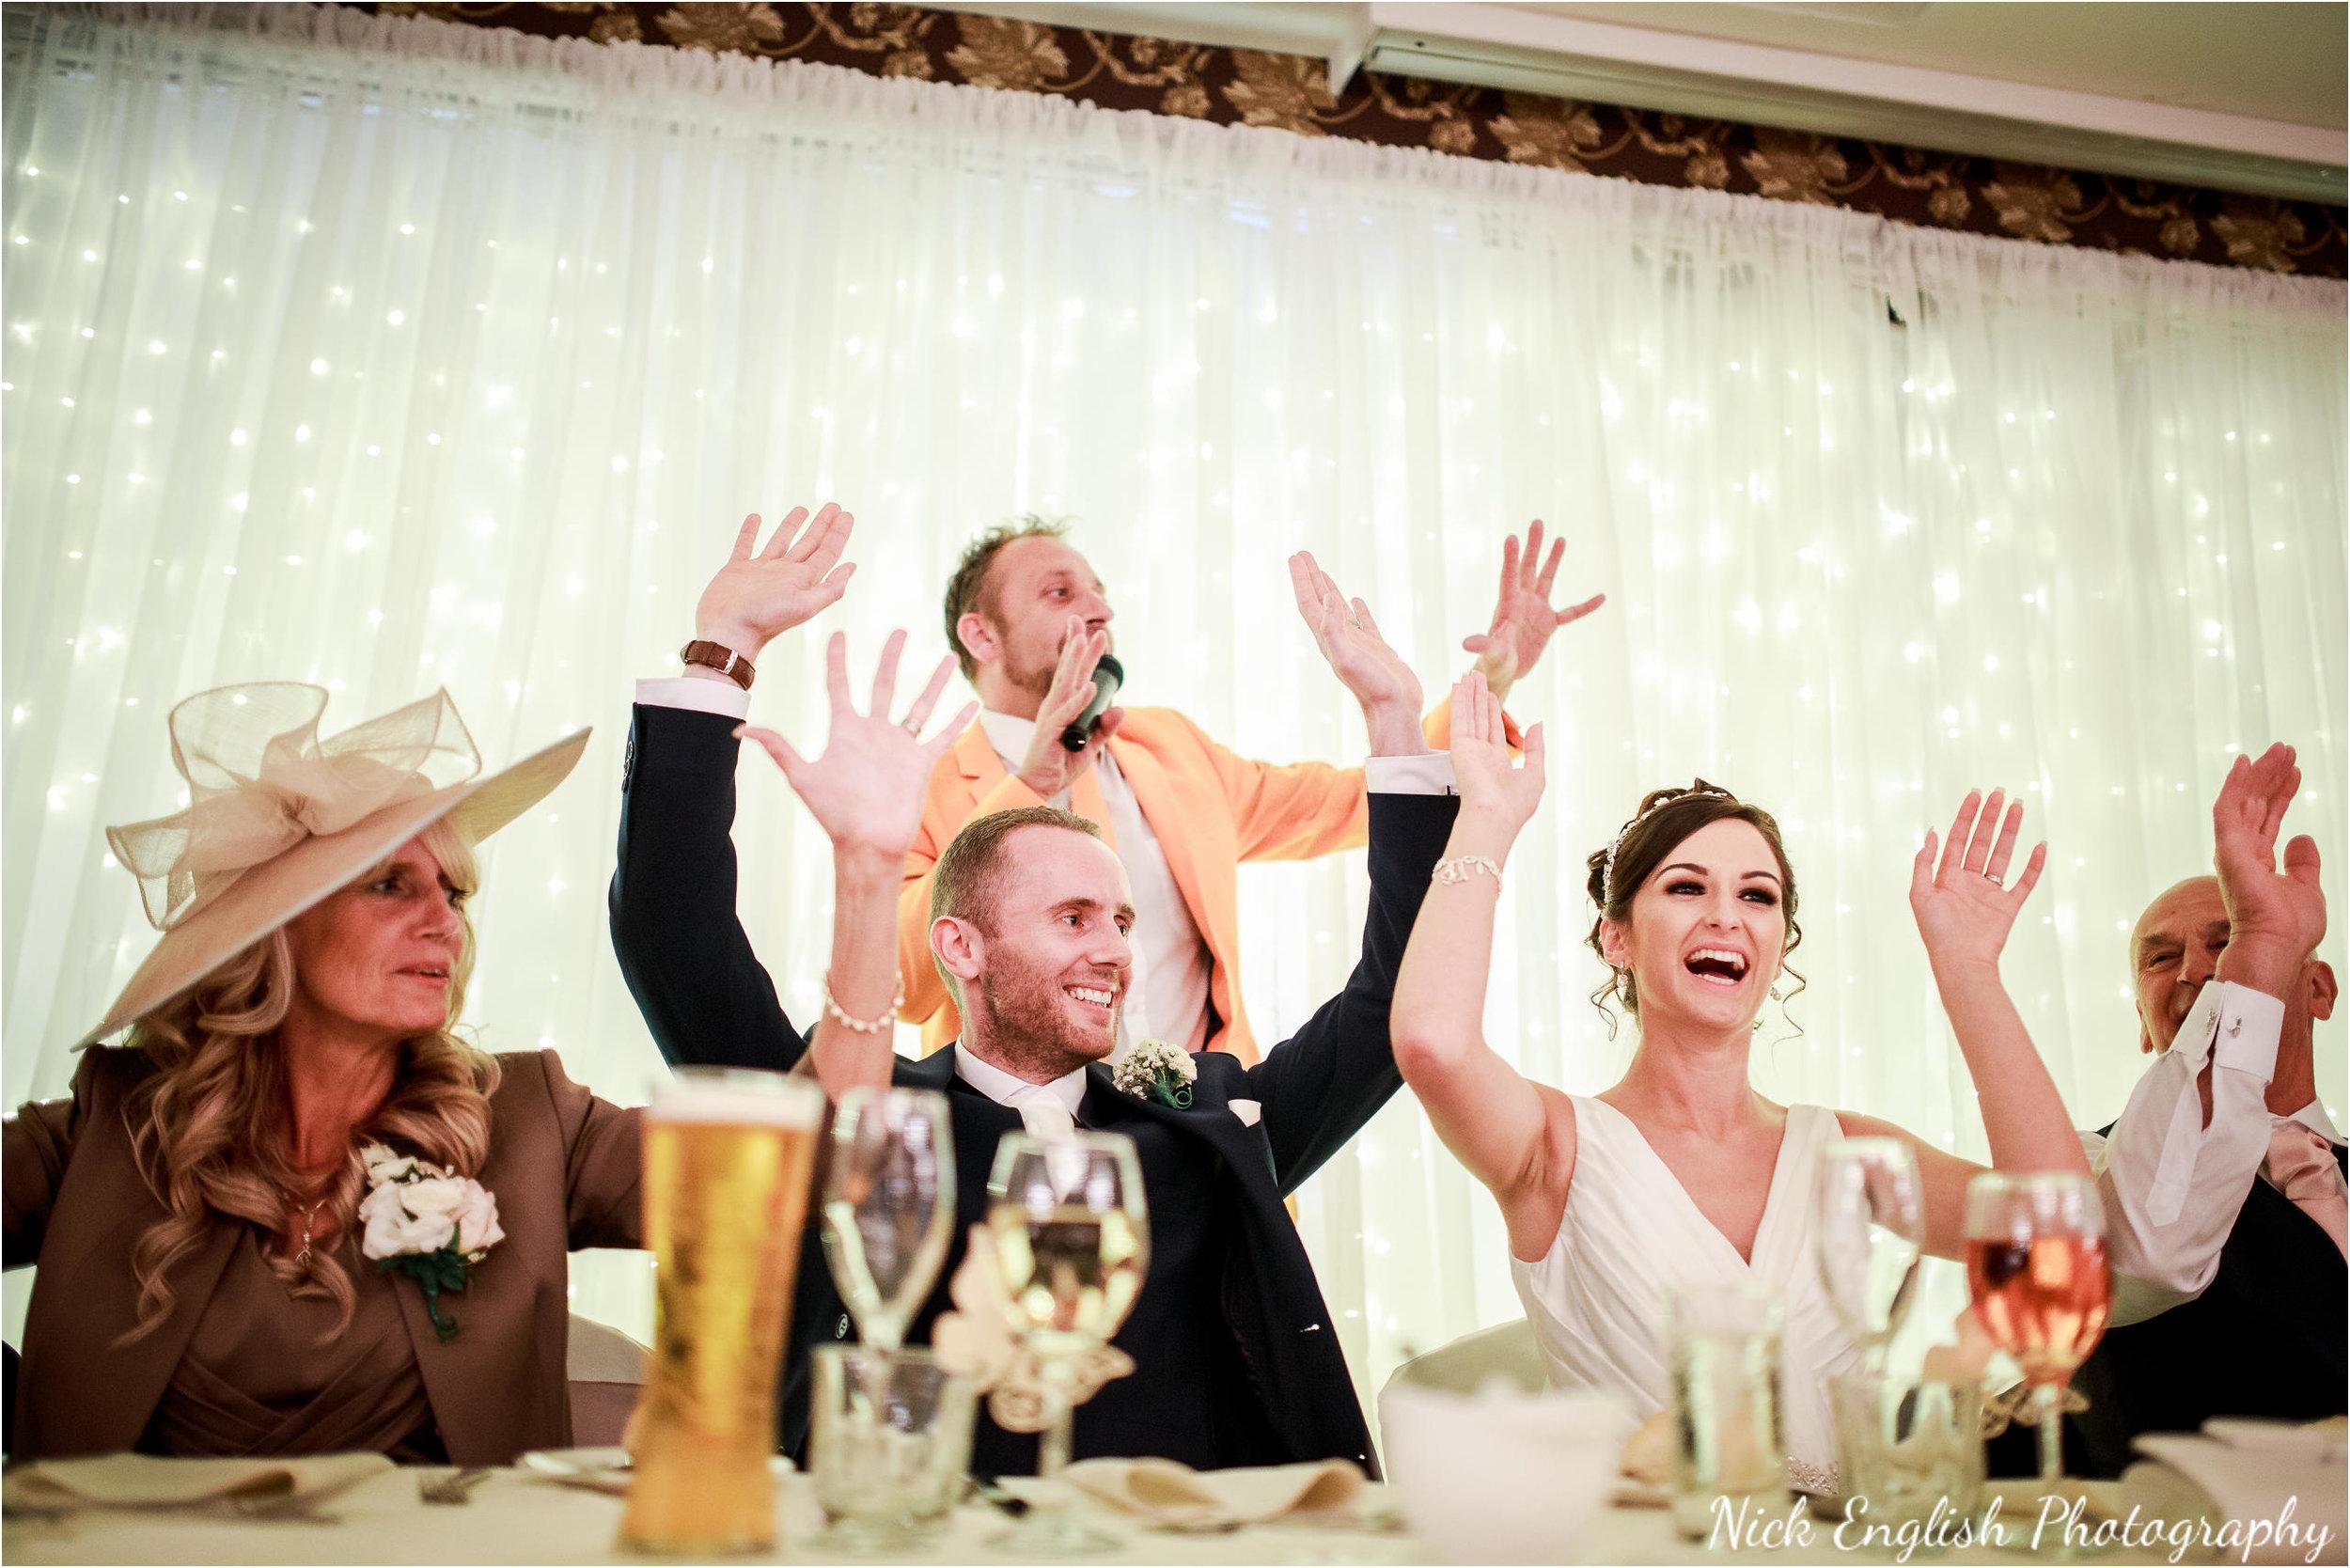 Emily David Wedding Photographs at Barton Grange Preston by Nick English Photography 167jpg.jpeg